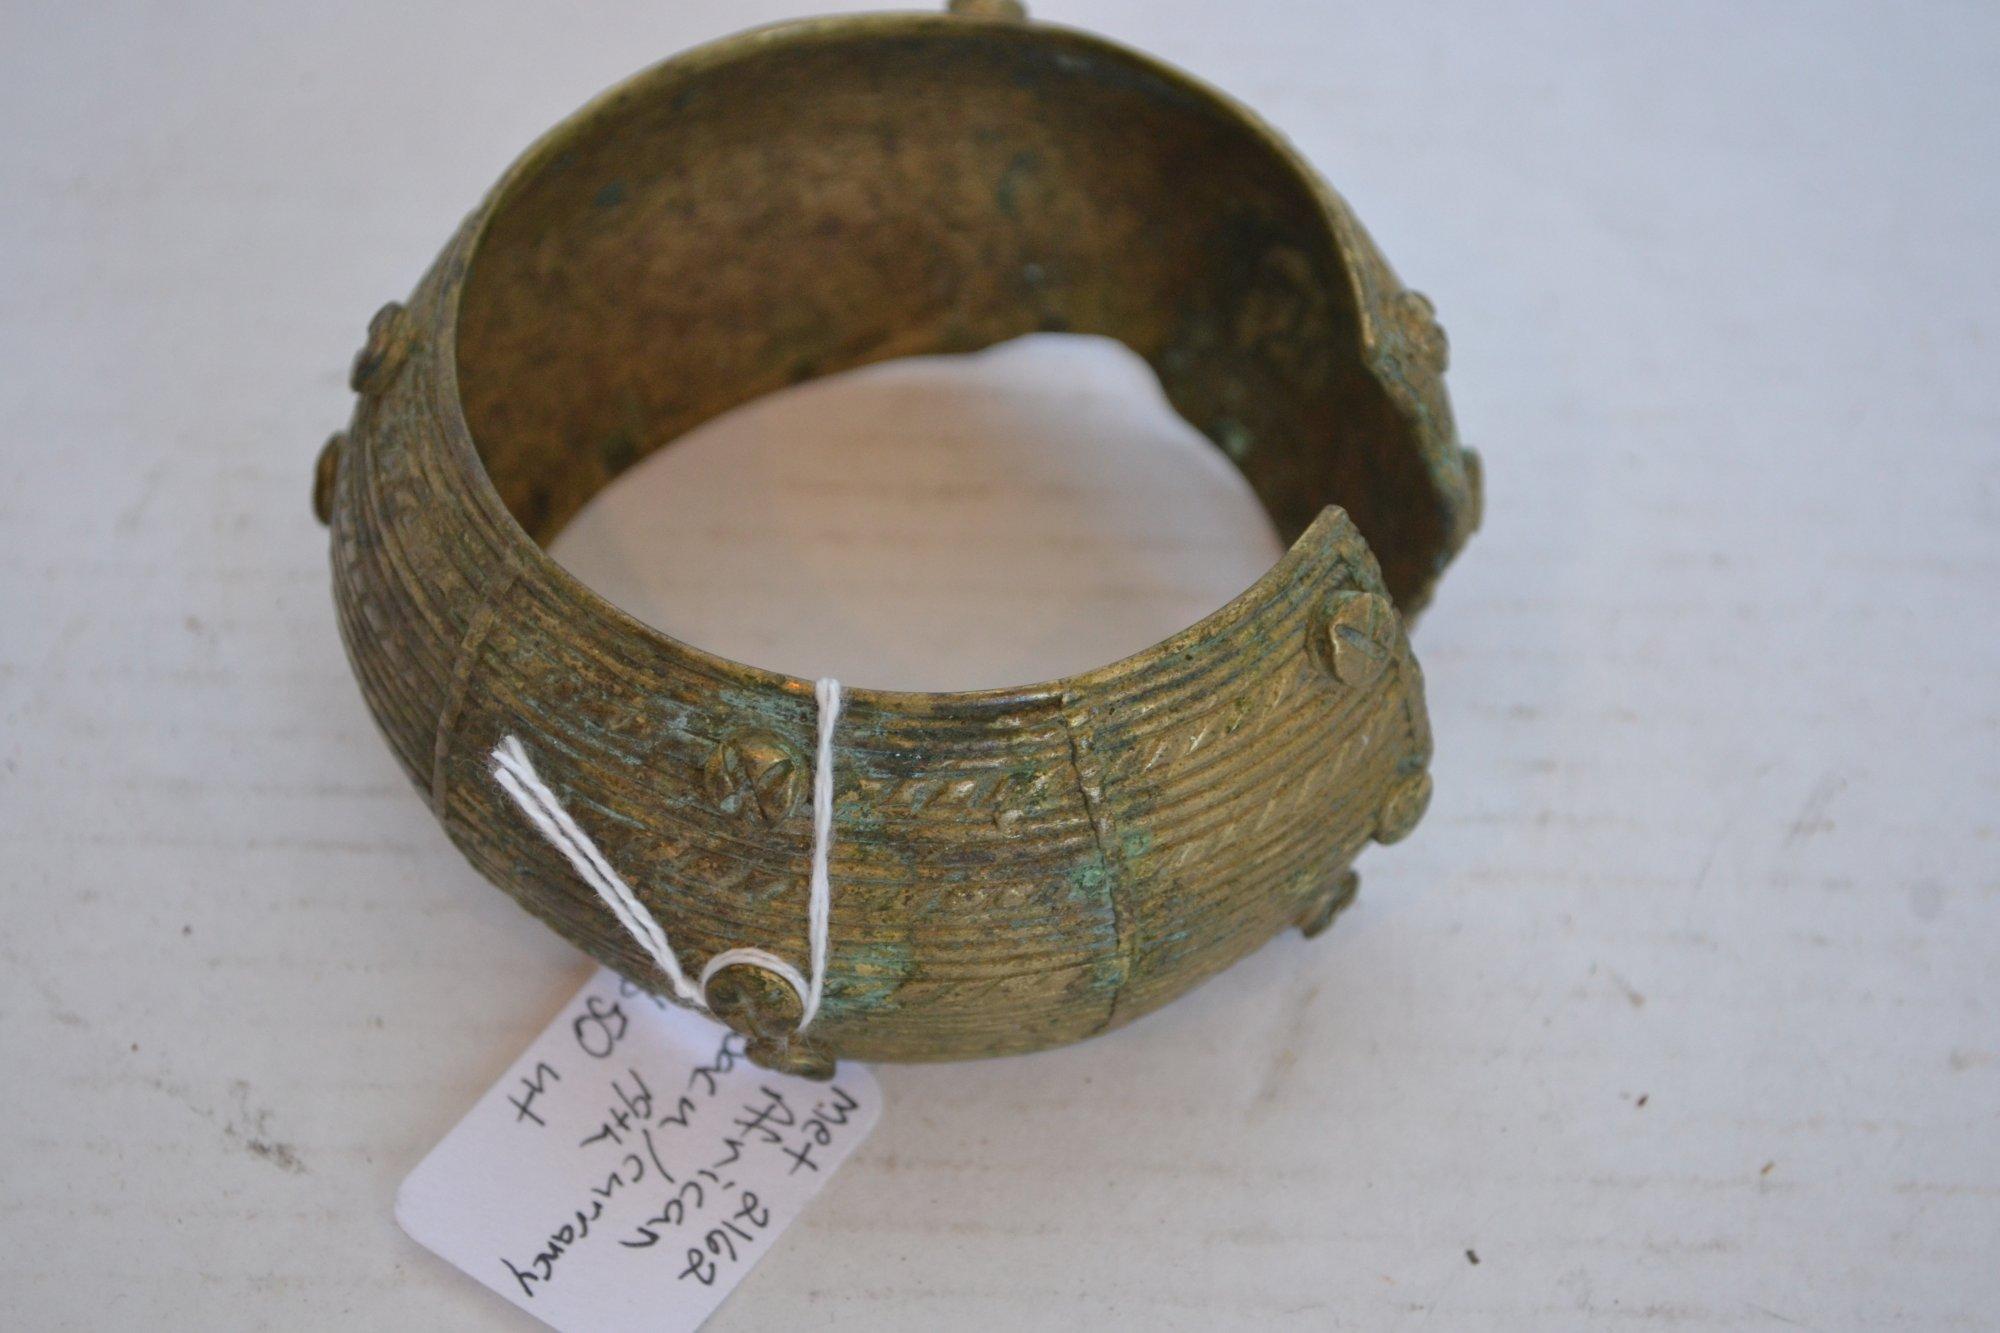 19th Century African Metal Bacu/ Currency bracelet H. 2 X W. 3.5